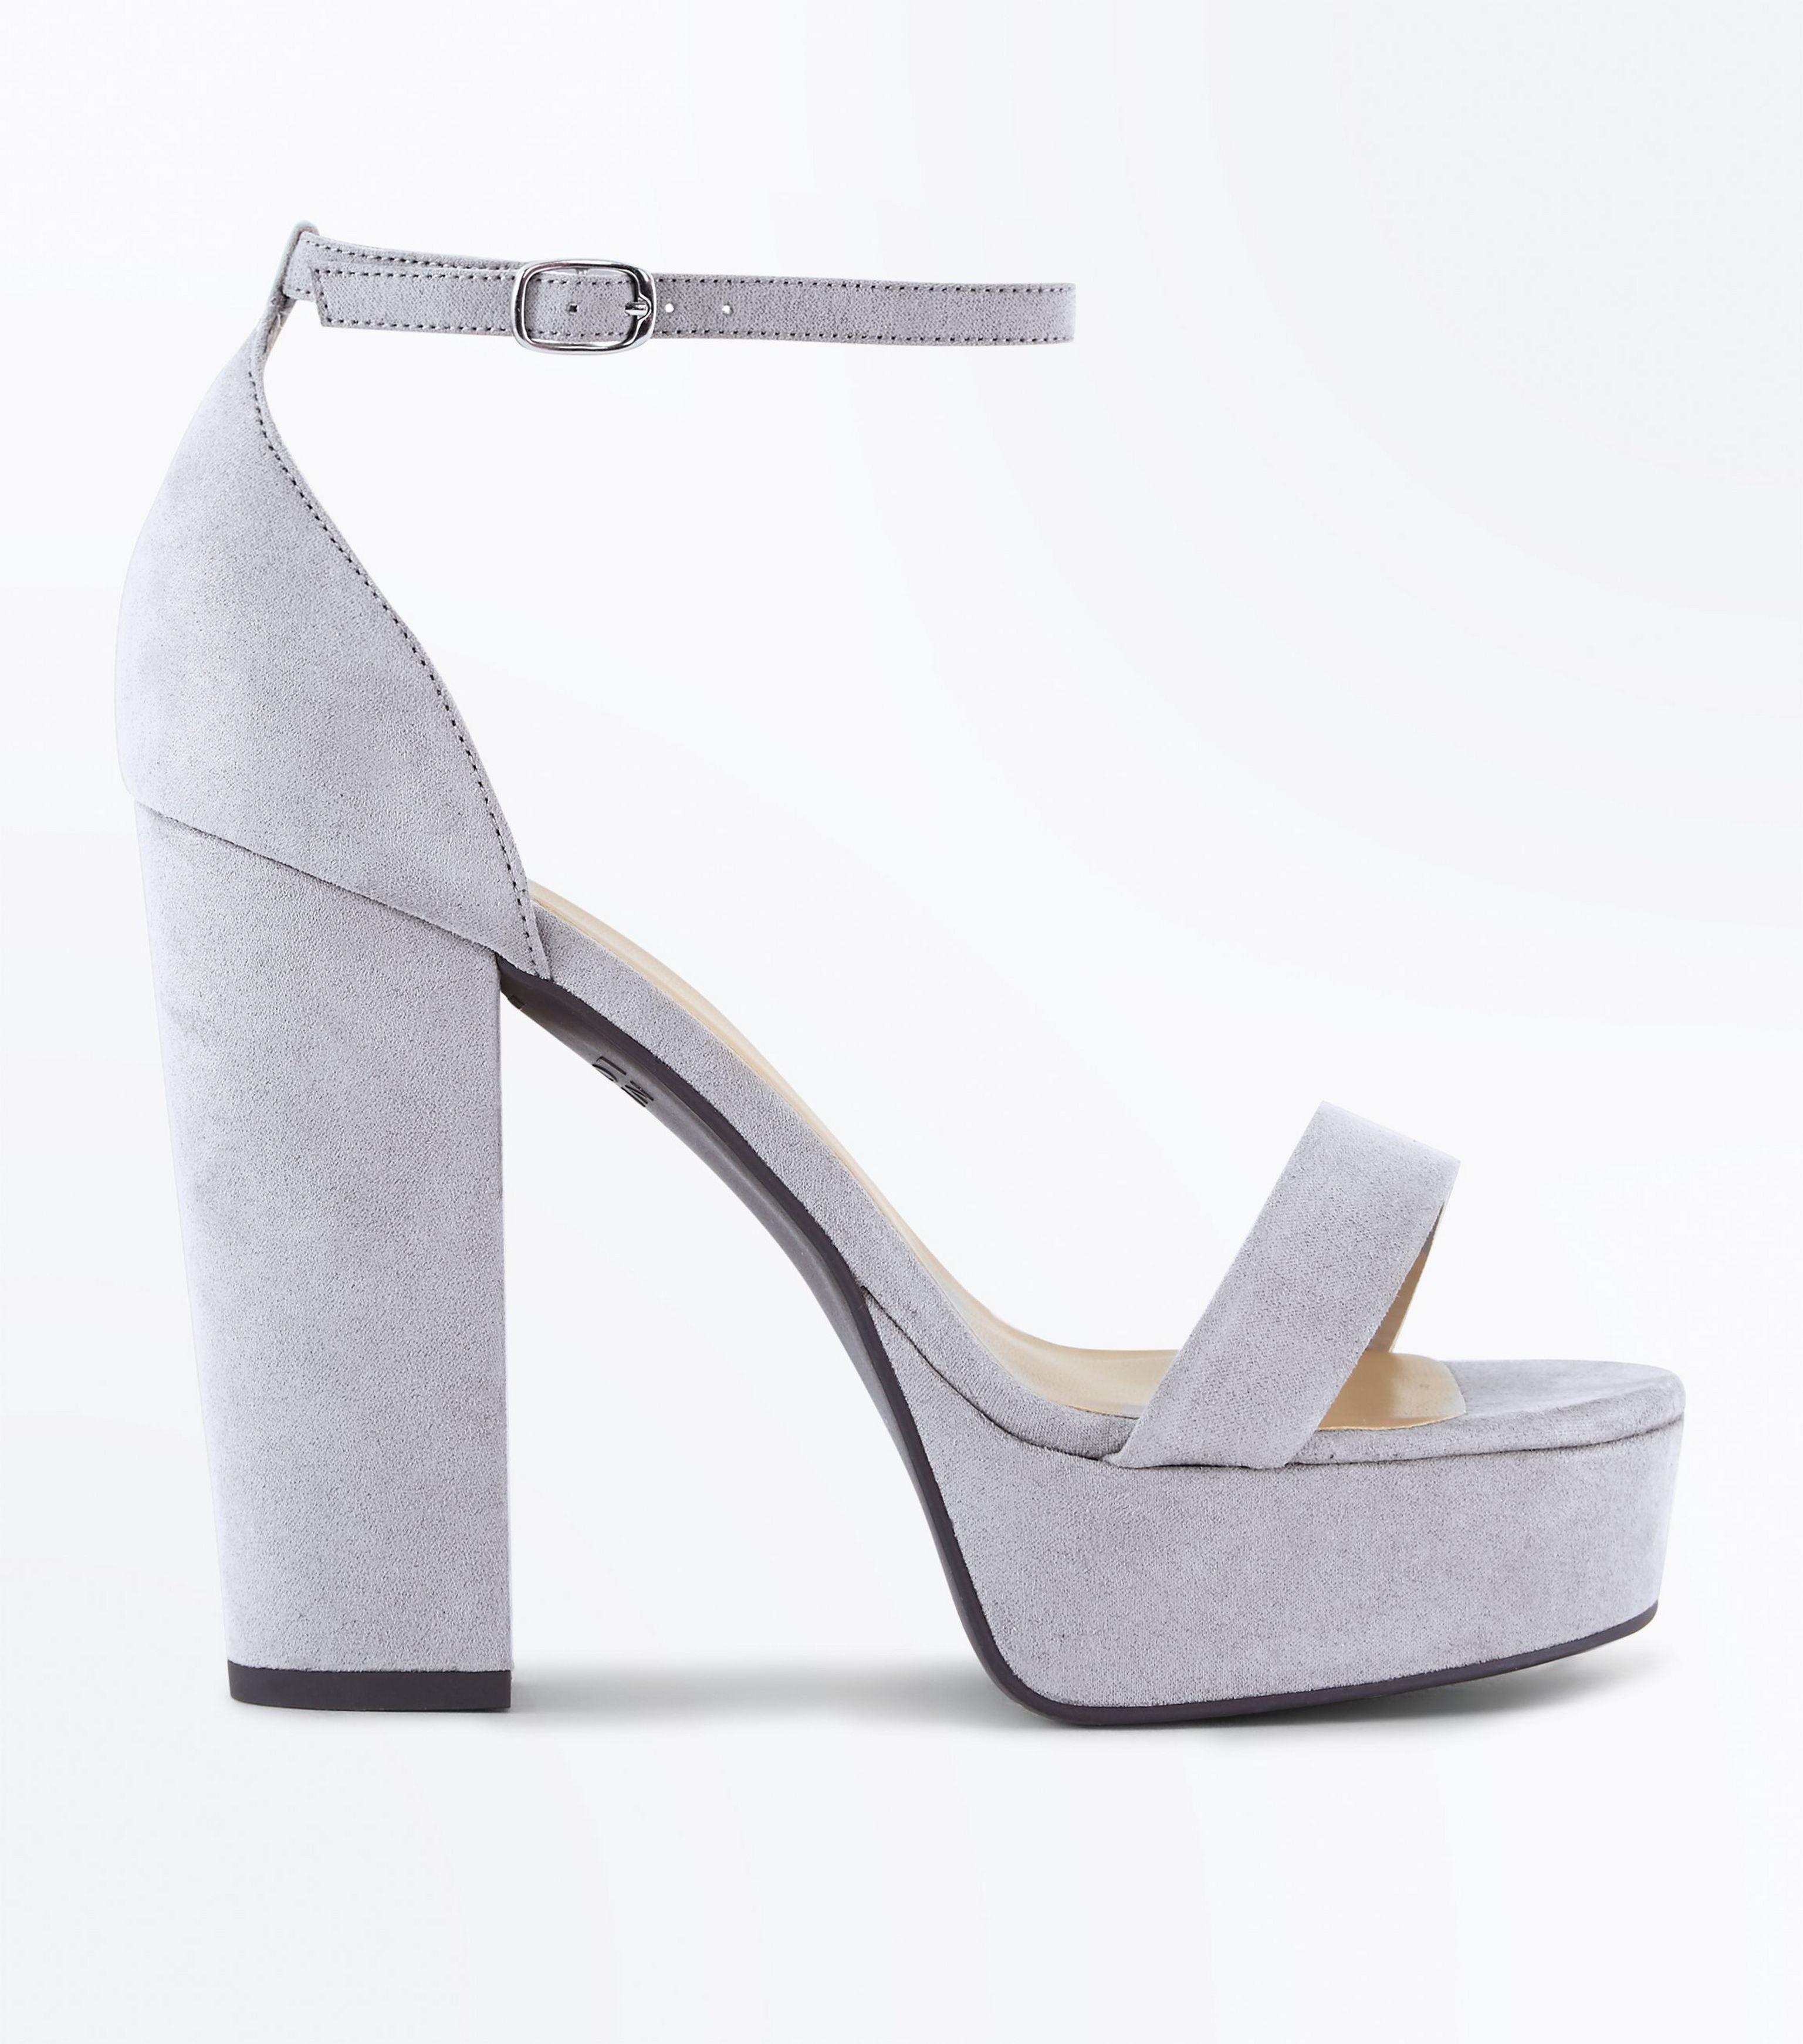 990ae065675 New Look Wide Fit Grey Suedette Platform Block Heels in Gray - Lyst